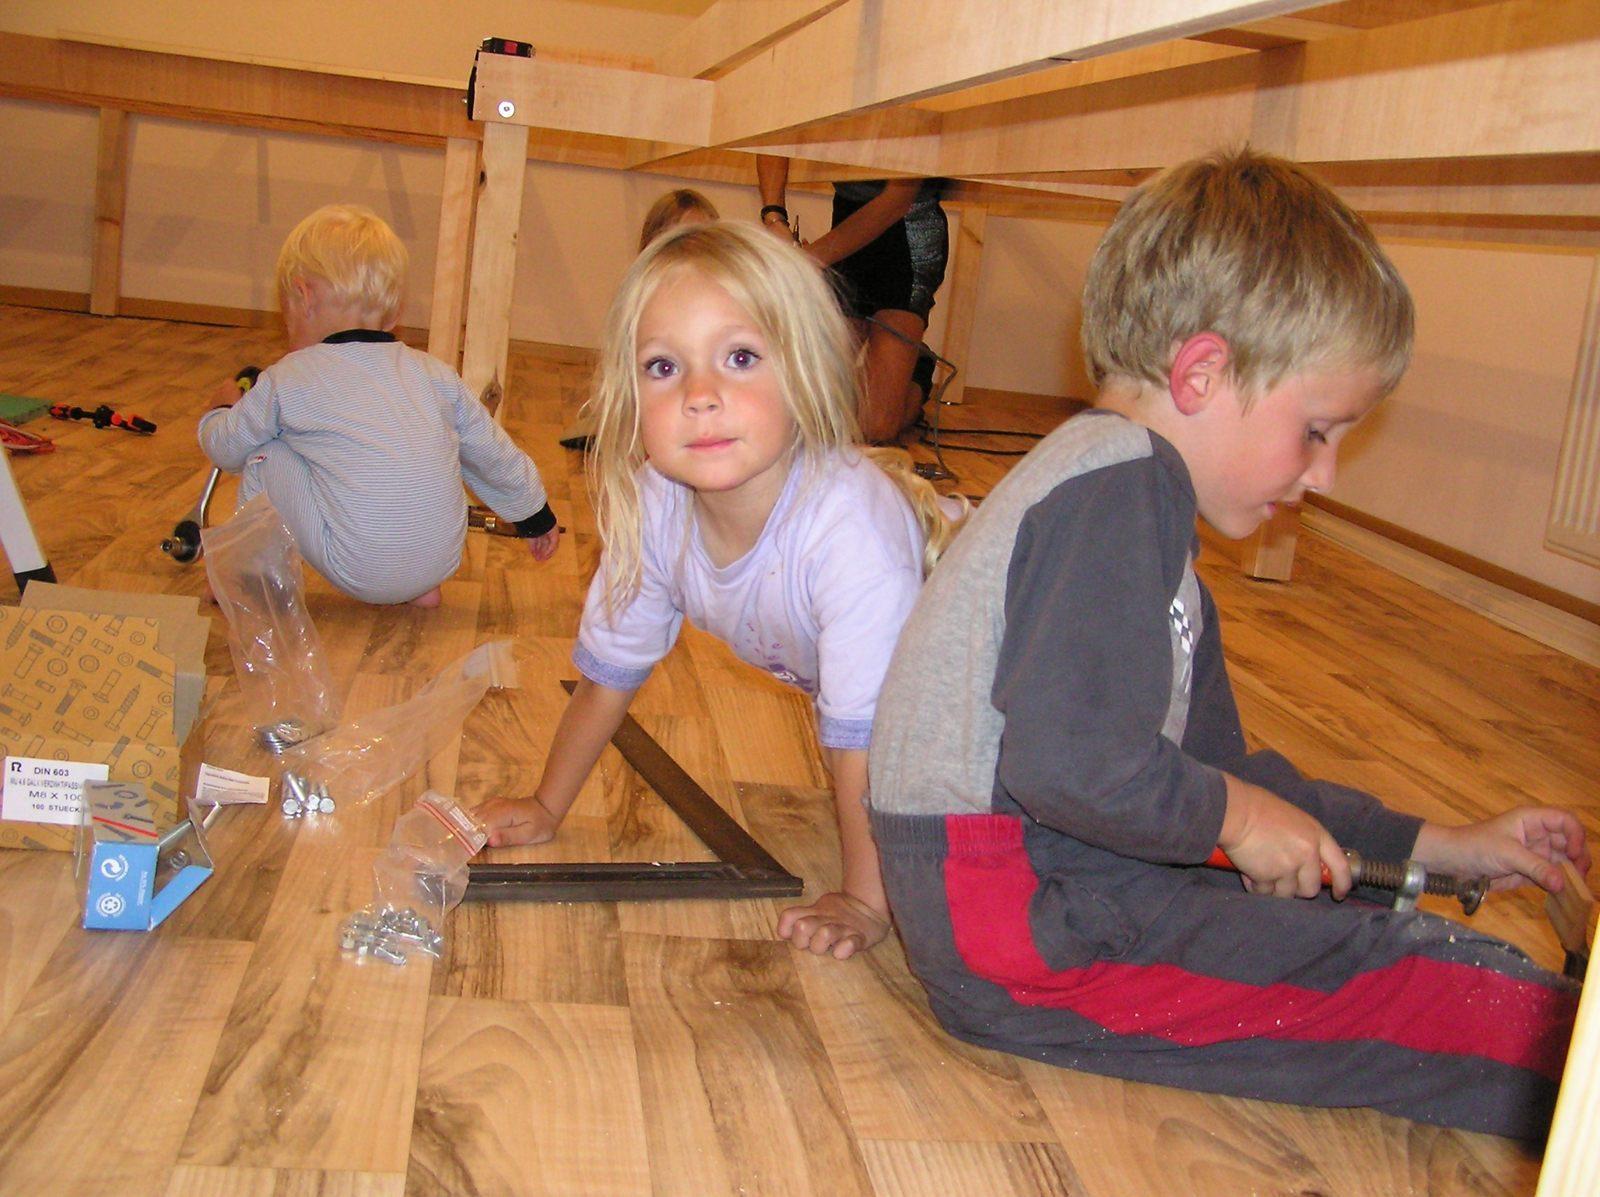 2007 Modellbahnkinder